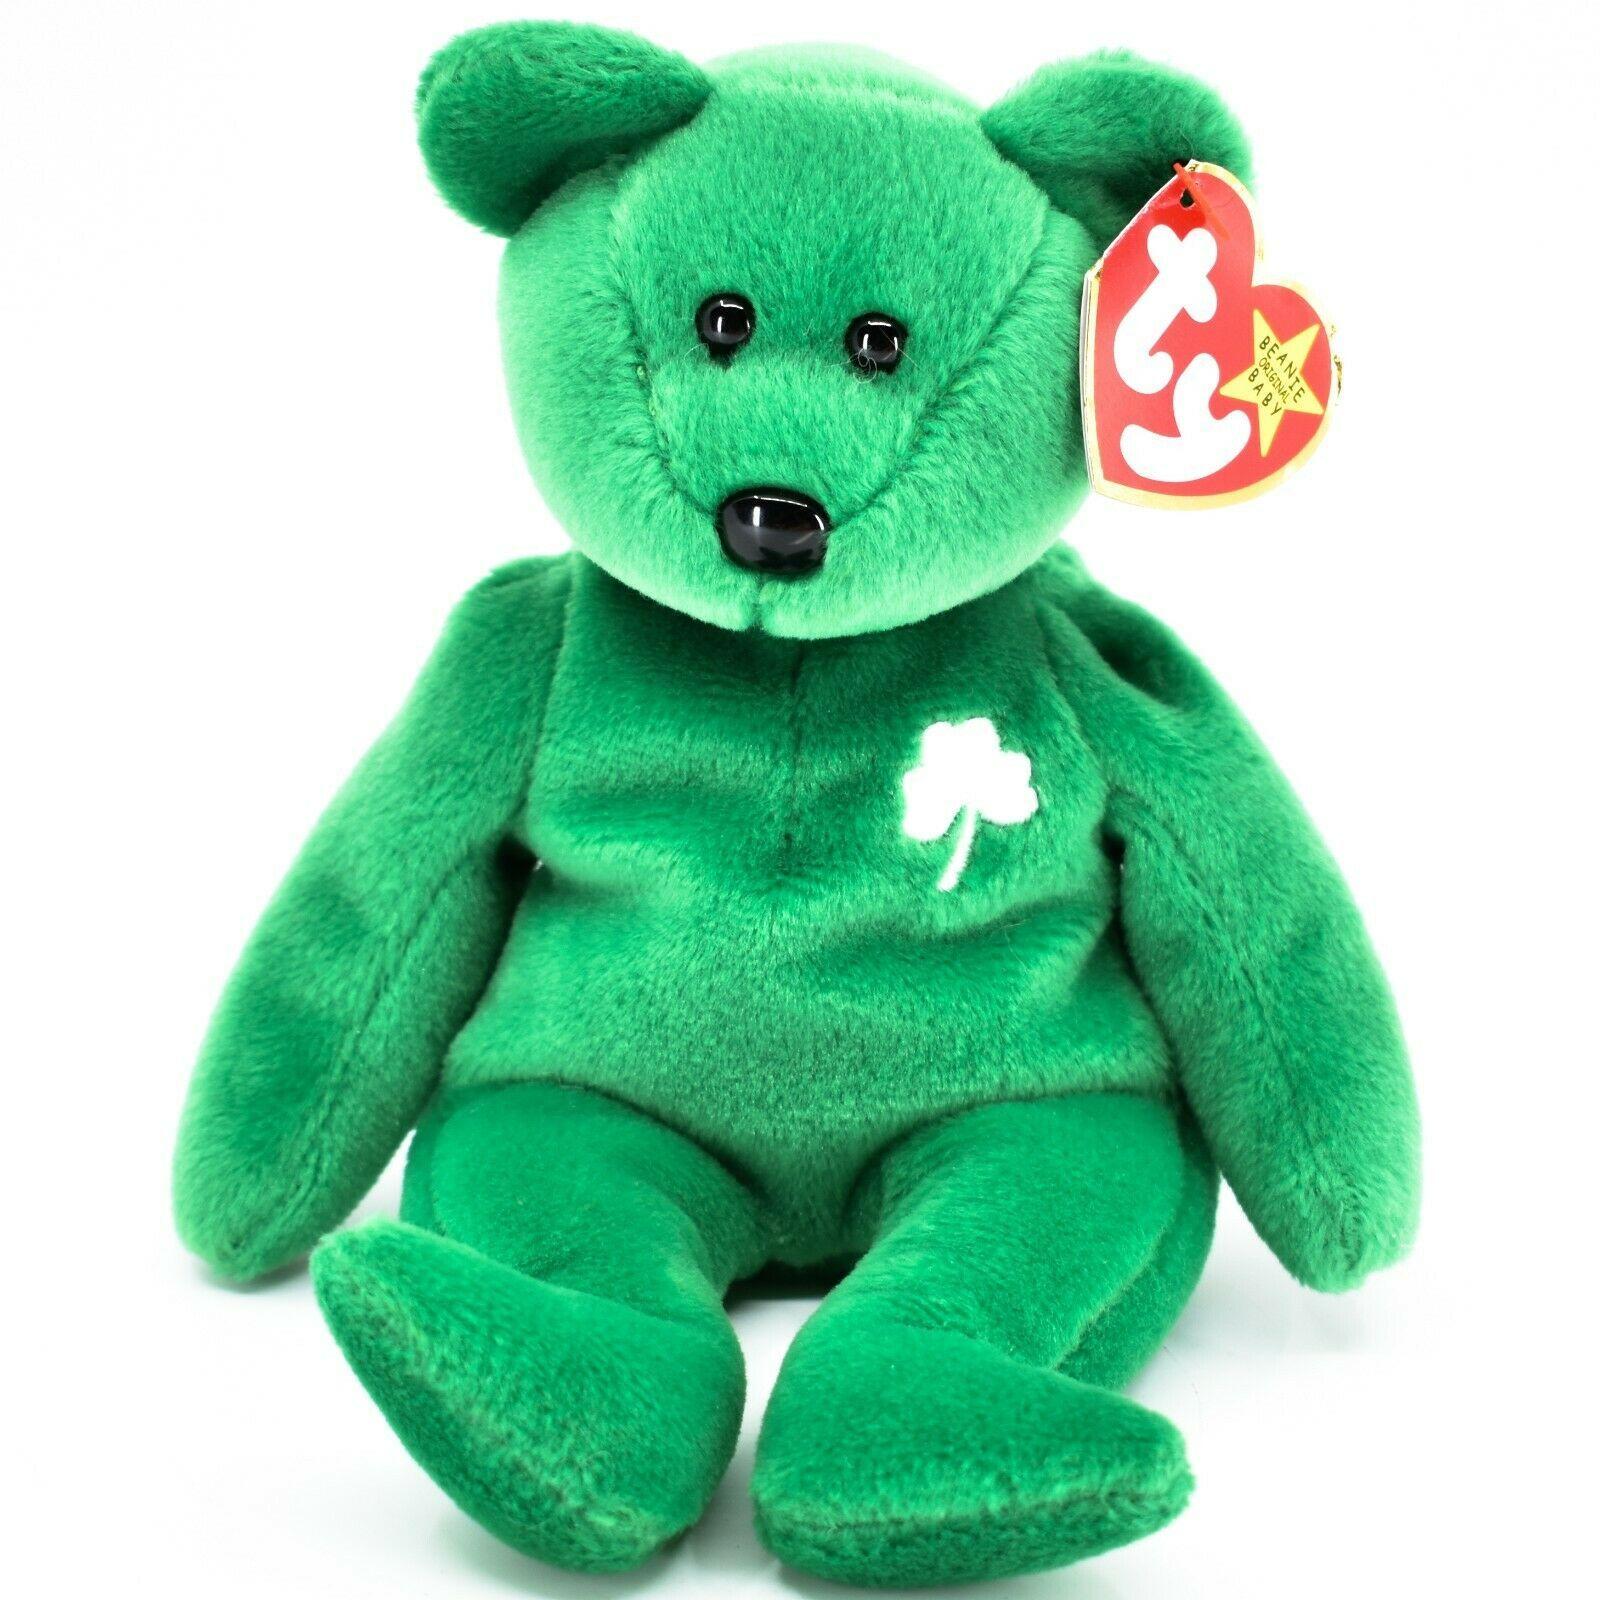 1997 Ty Beanie Baby Original Erin Lucky Shamrock Teddy Bear Beanbag Plush Toy